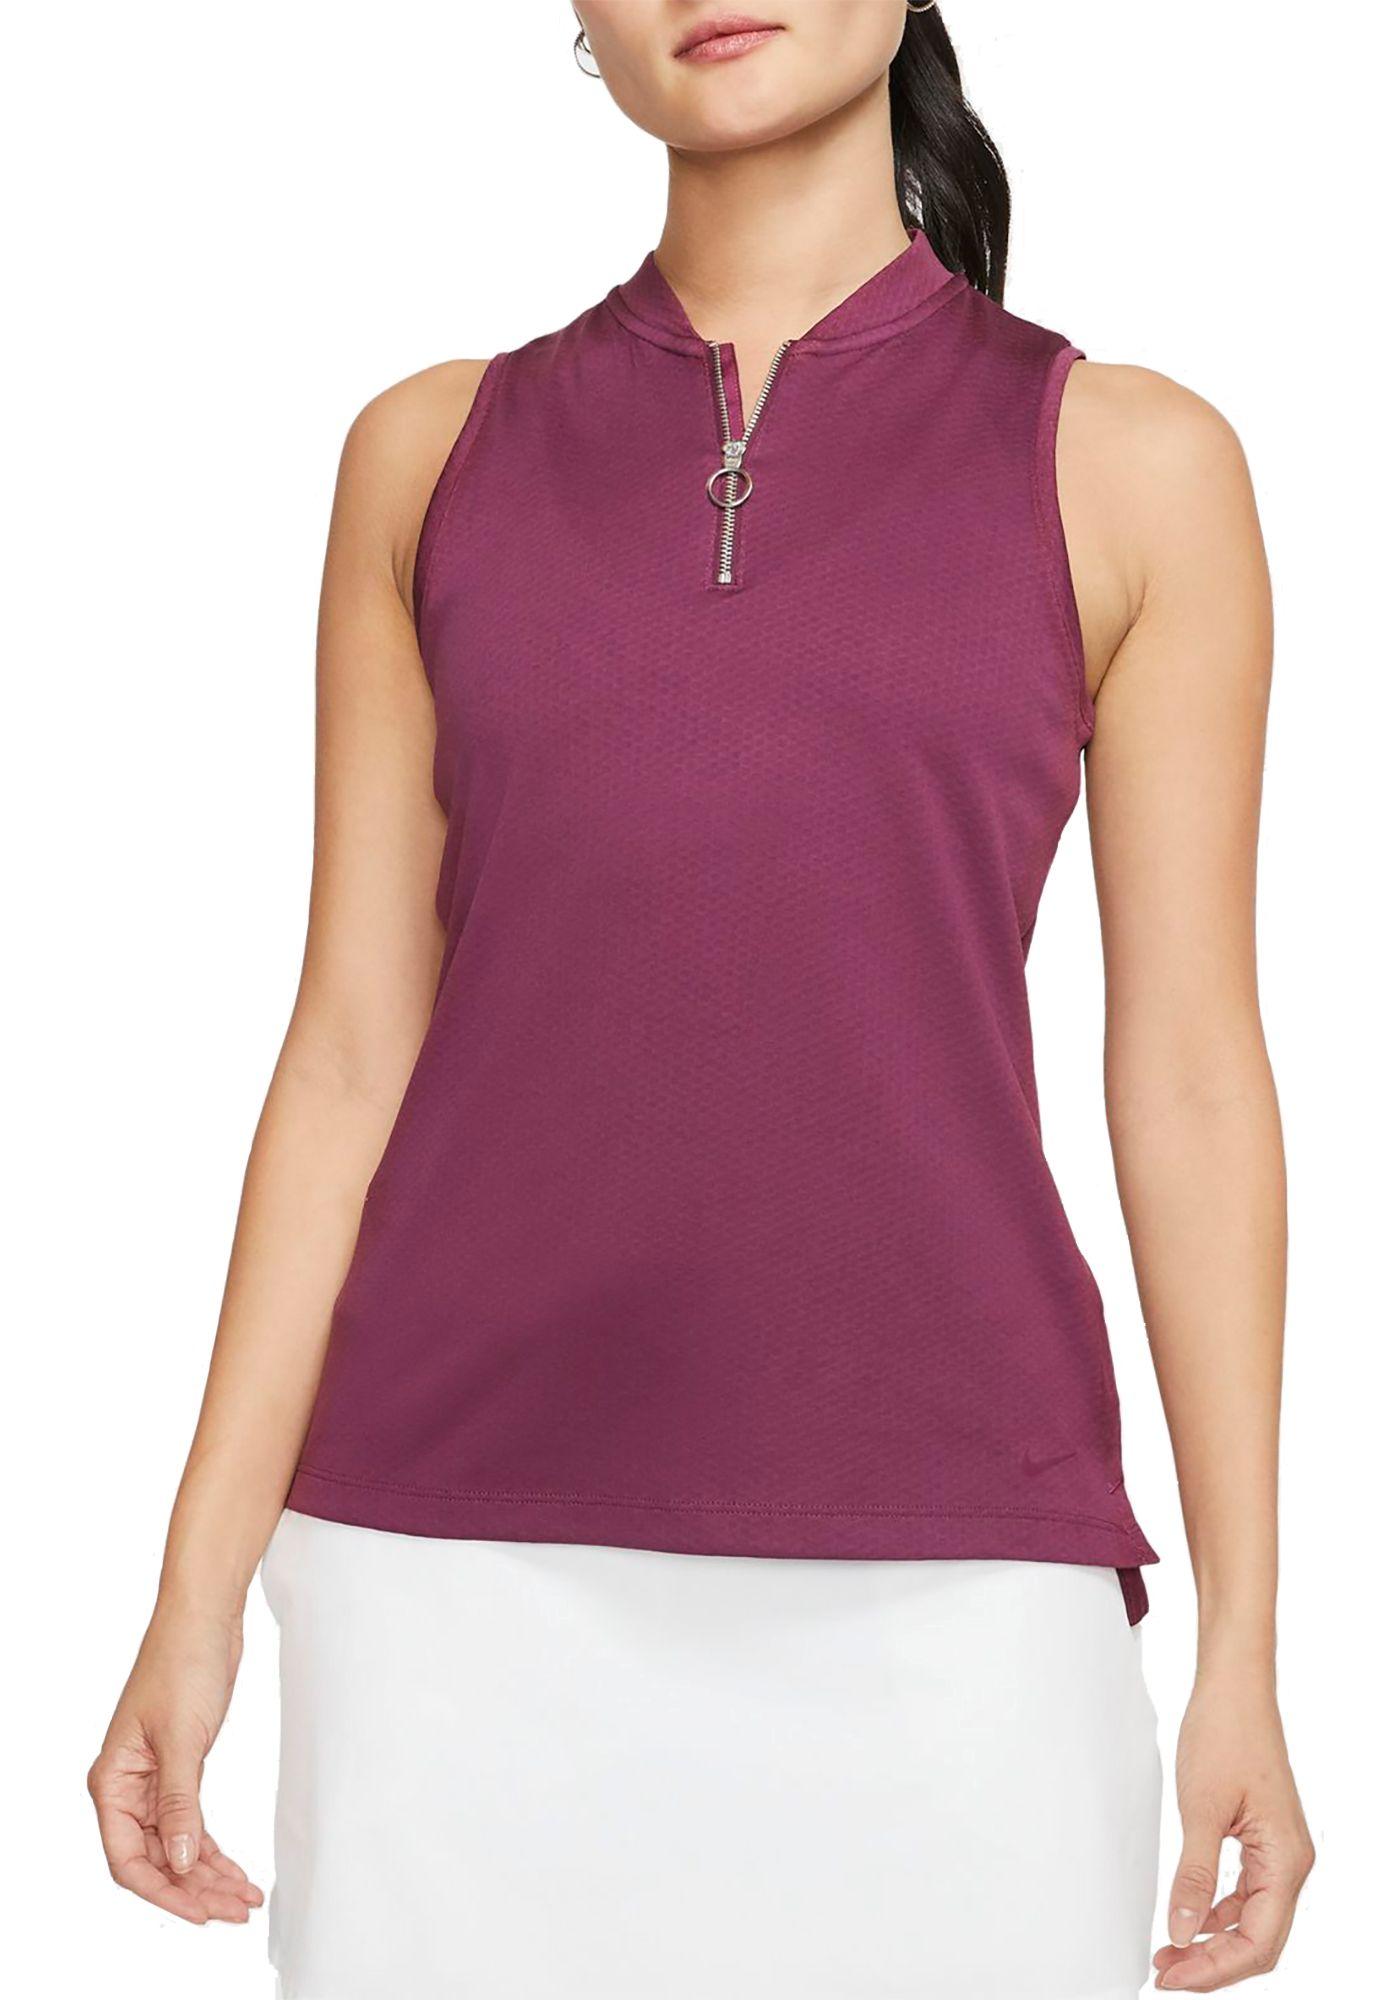 Nike Women's Dri-FIT Sleeveless Golf Polo